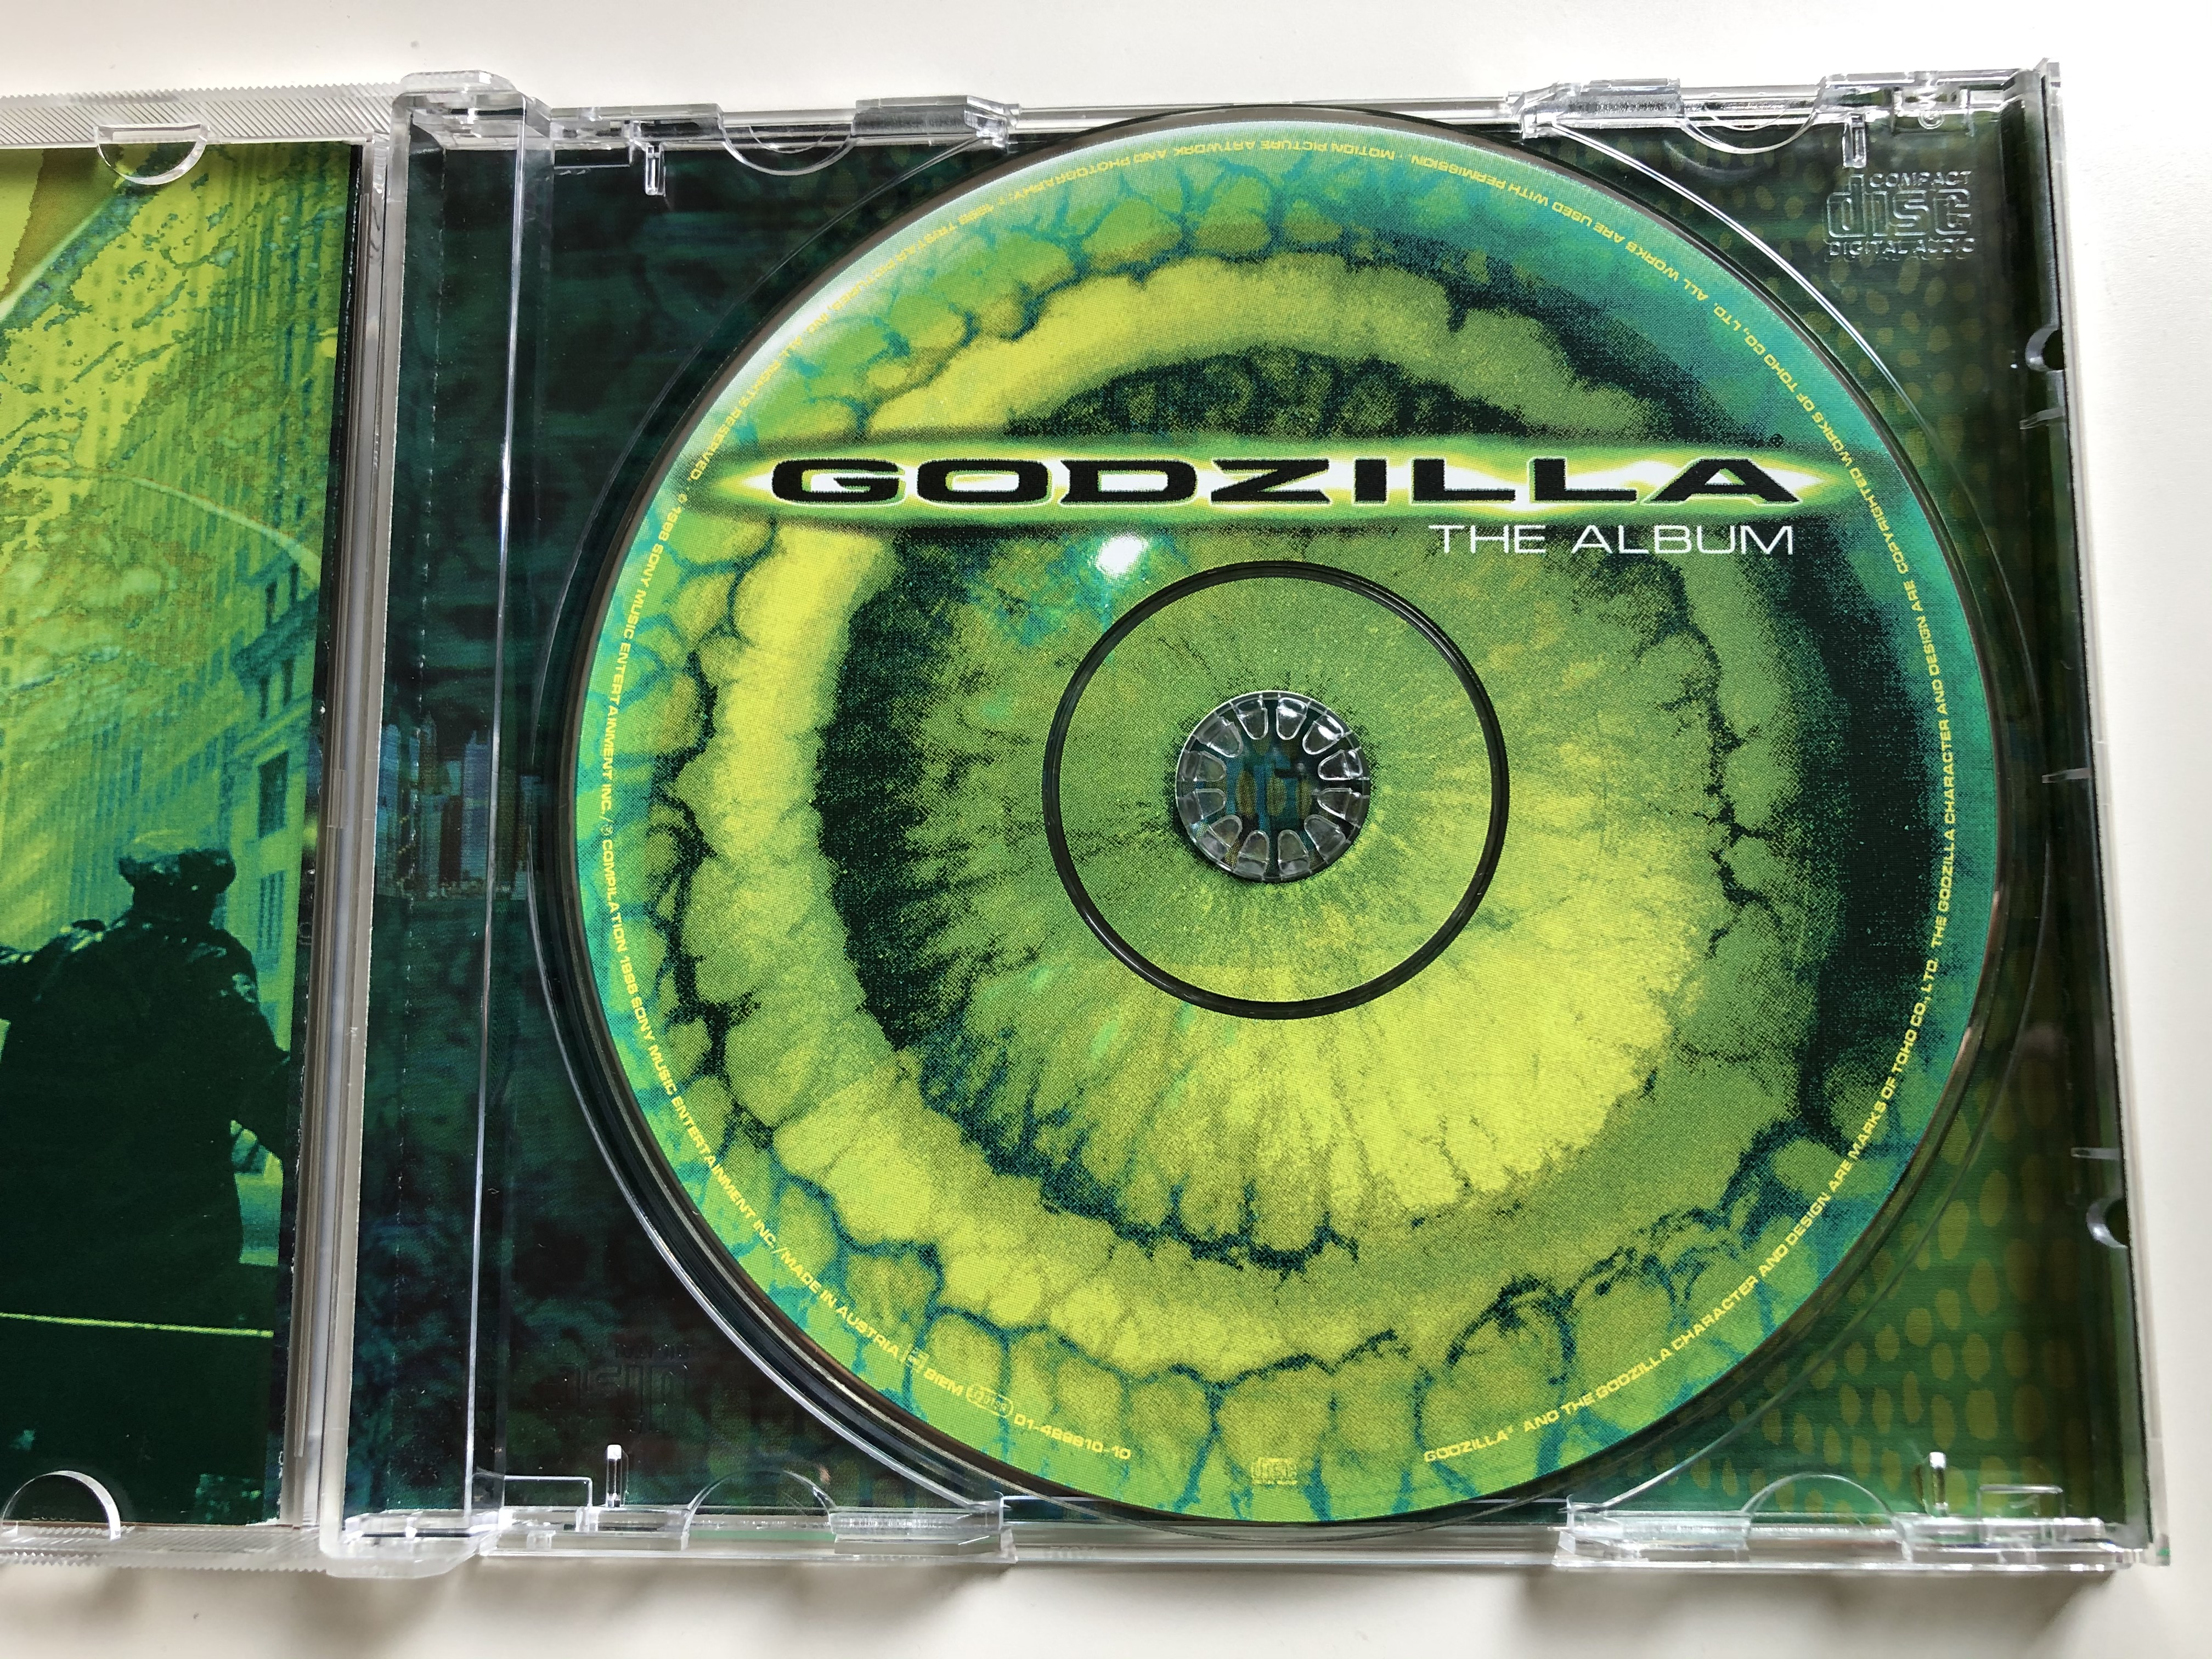 the-album-godzilla-sony-music-soundtrax-audio-cd-1998-489610-2-8-.jpg